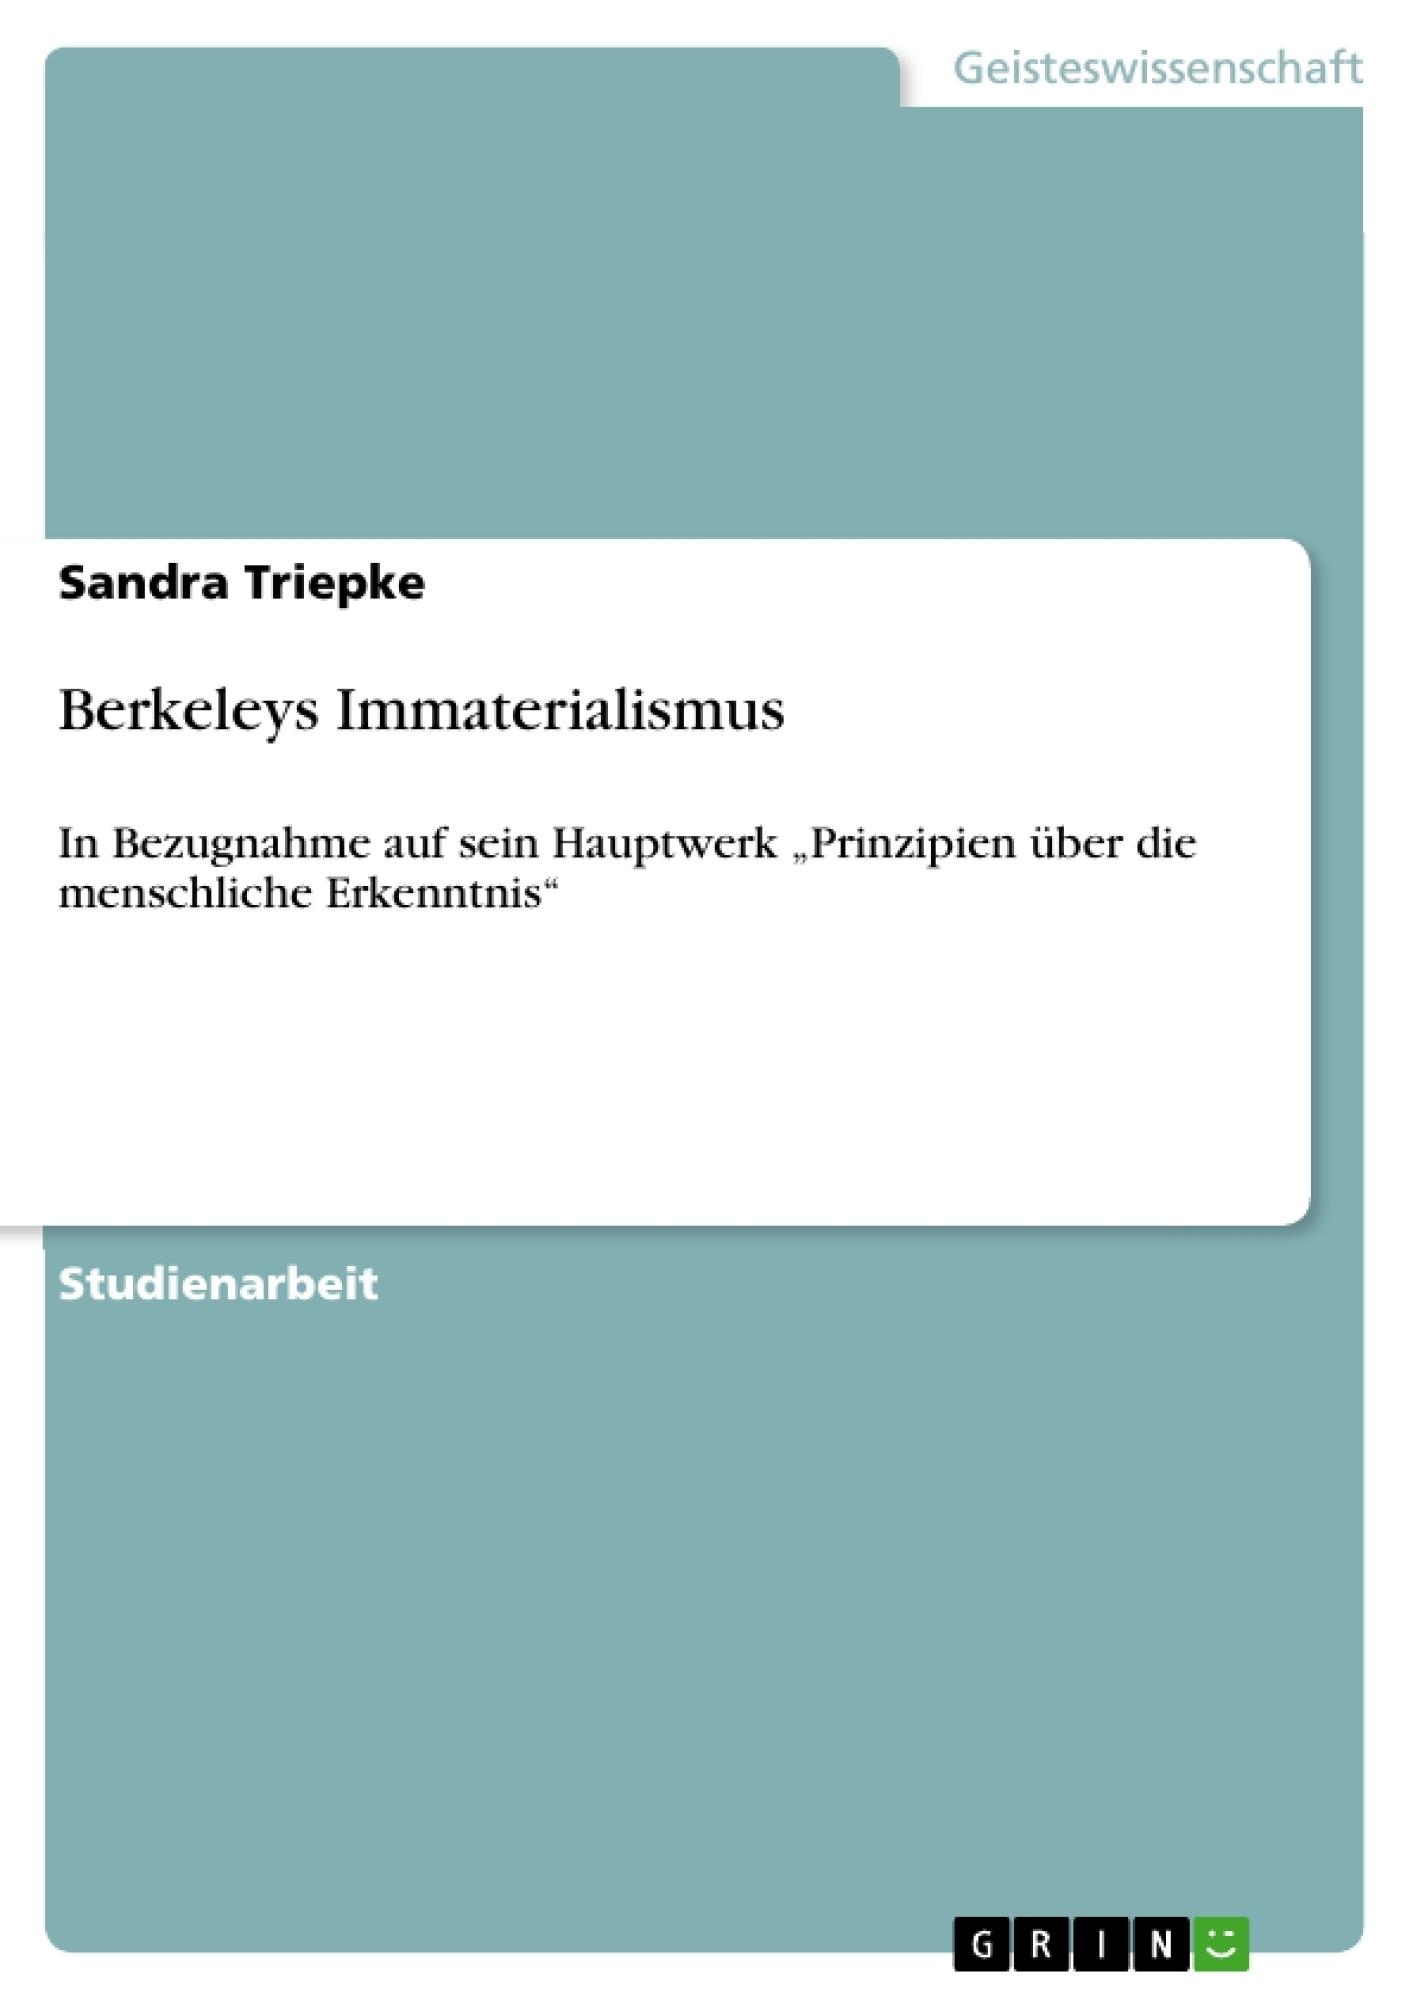 Titel: Berkeleys Immaterialismus